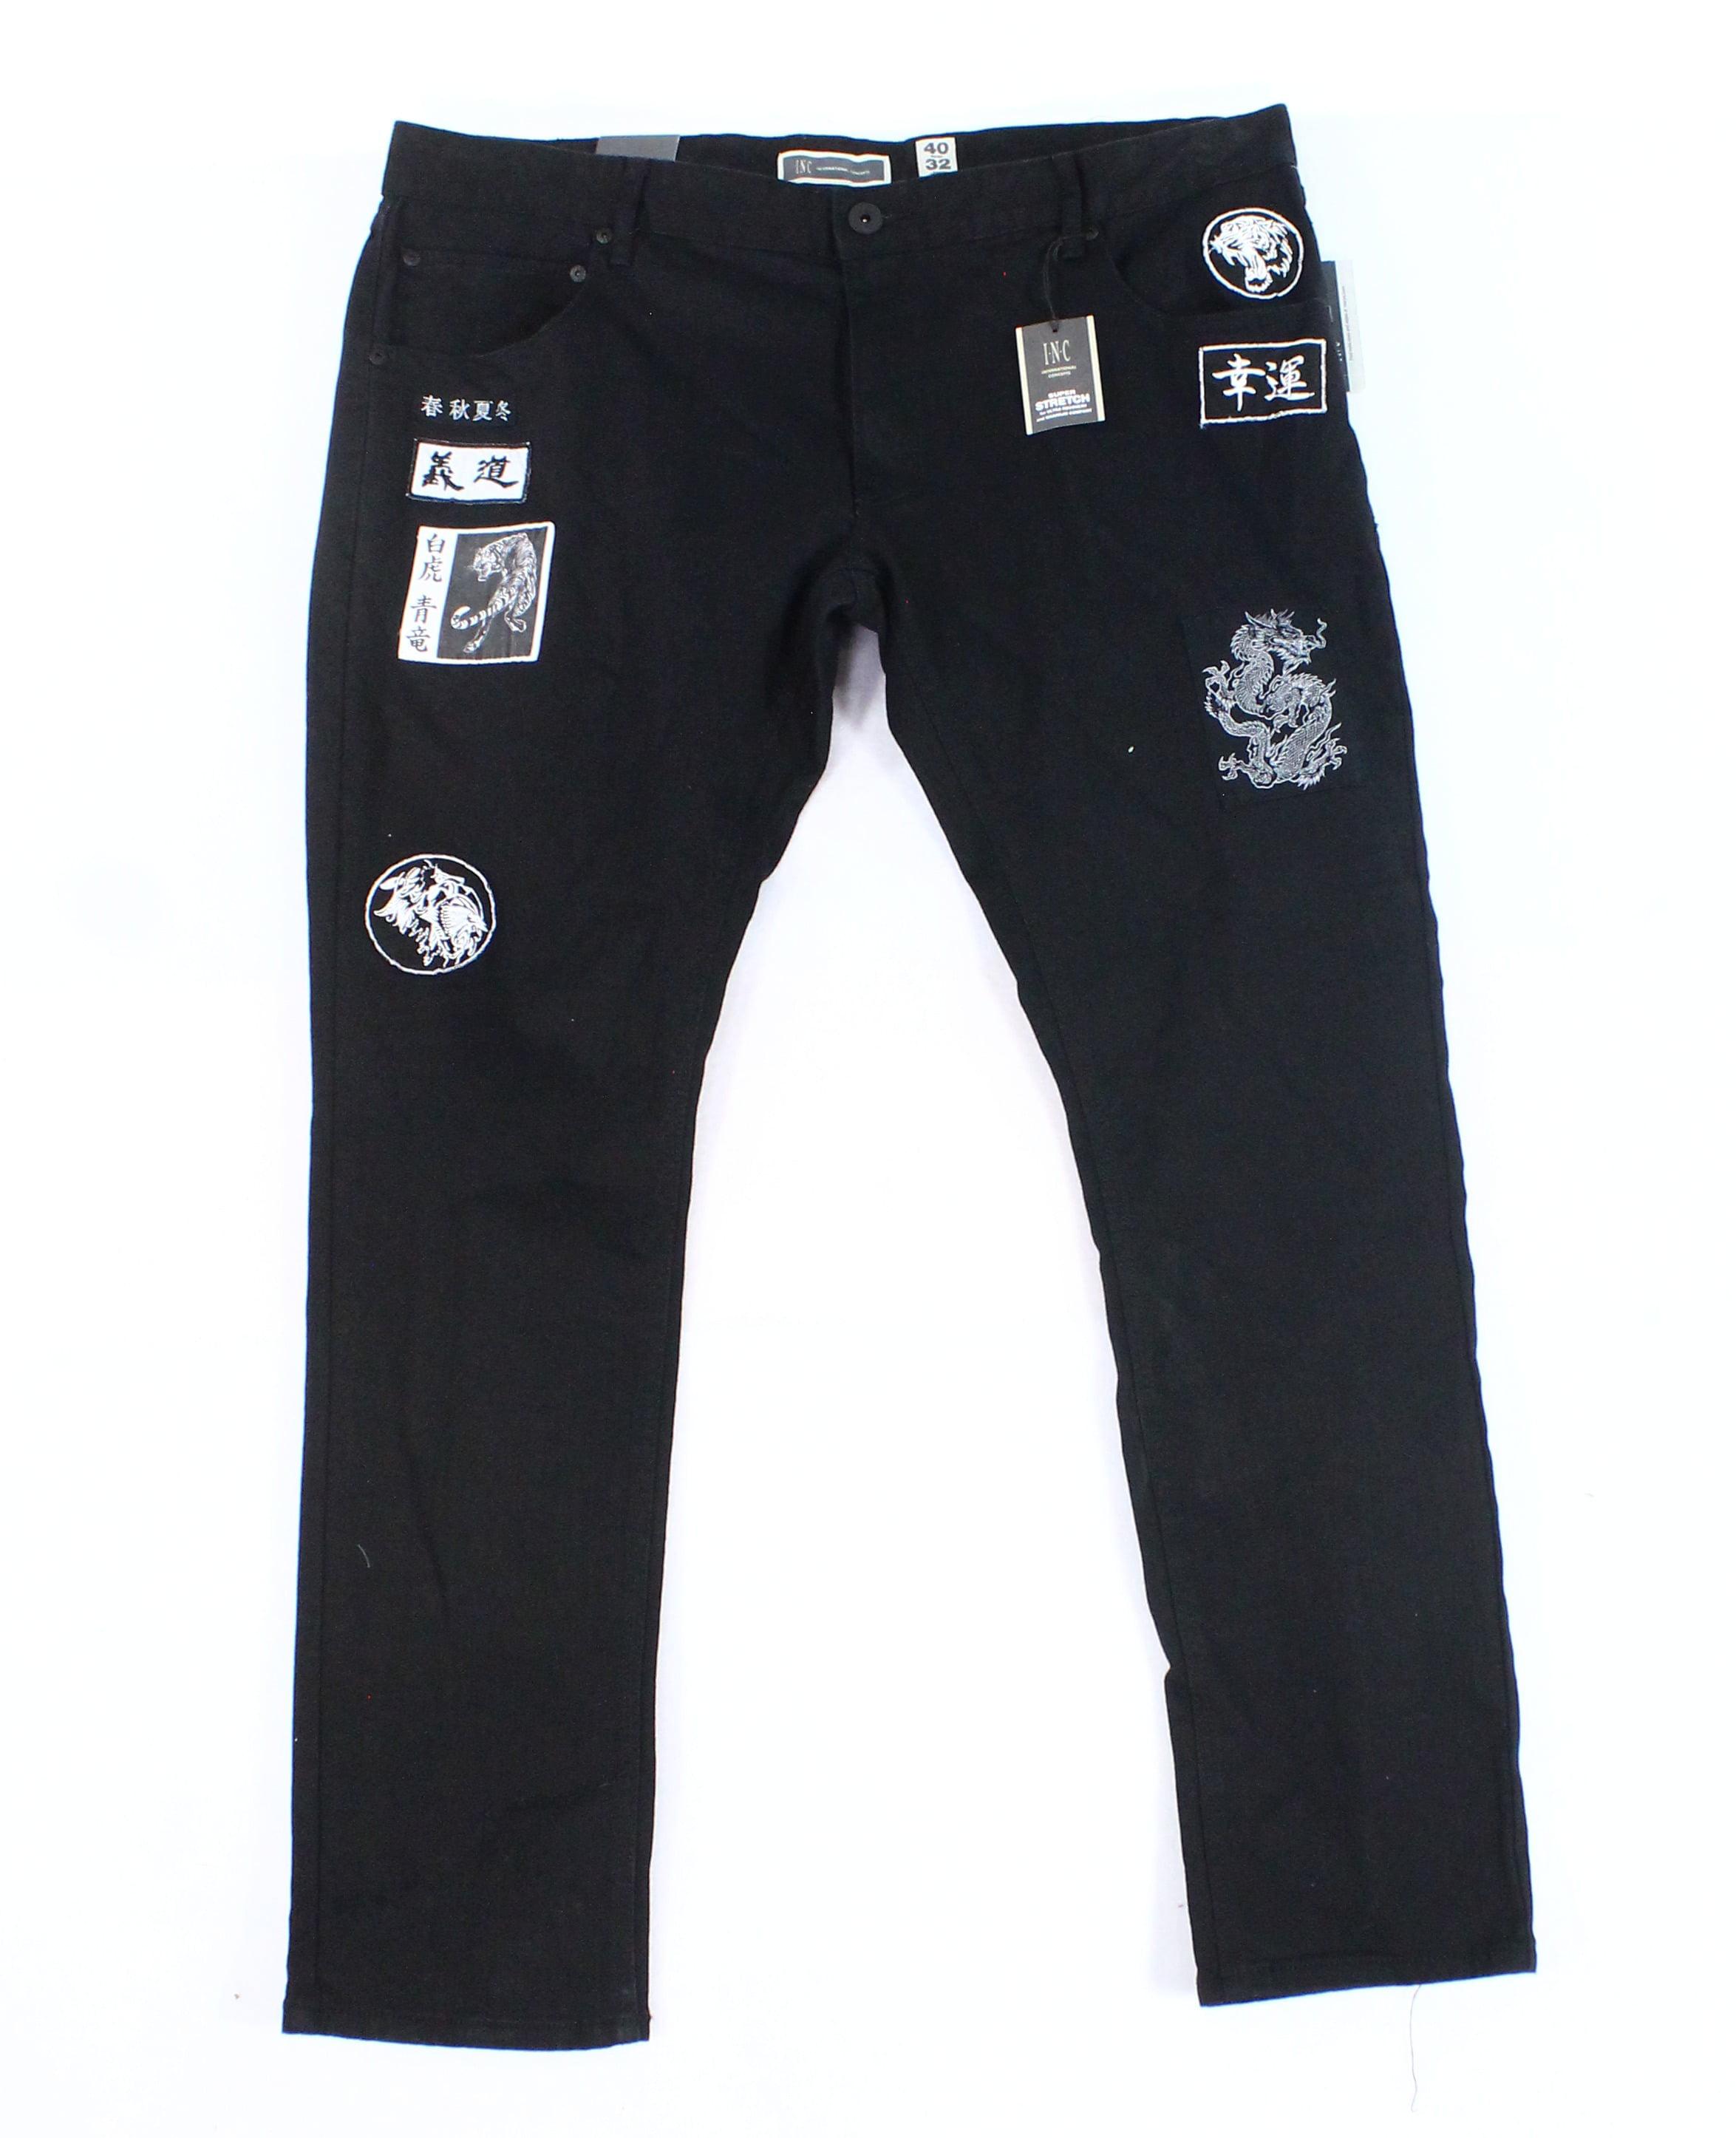 INC NEW Black Men's Size 40x32 Skinny Stretch Patched Denim Jeans